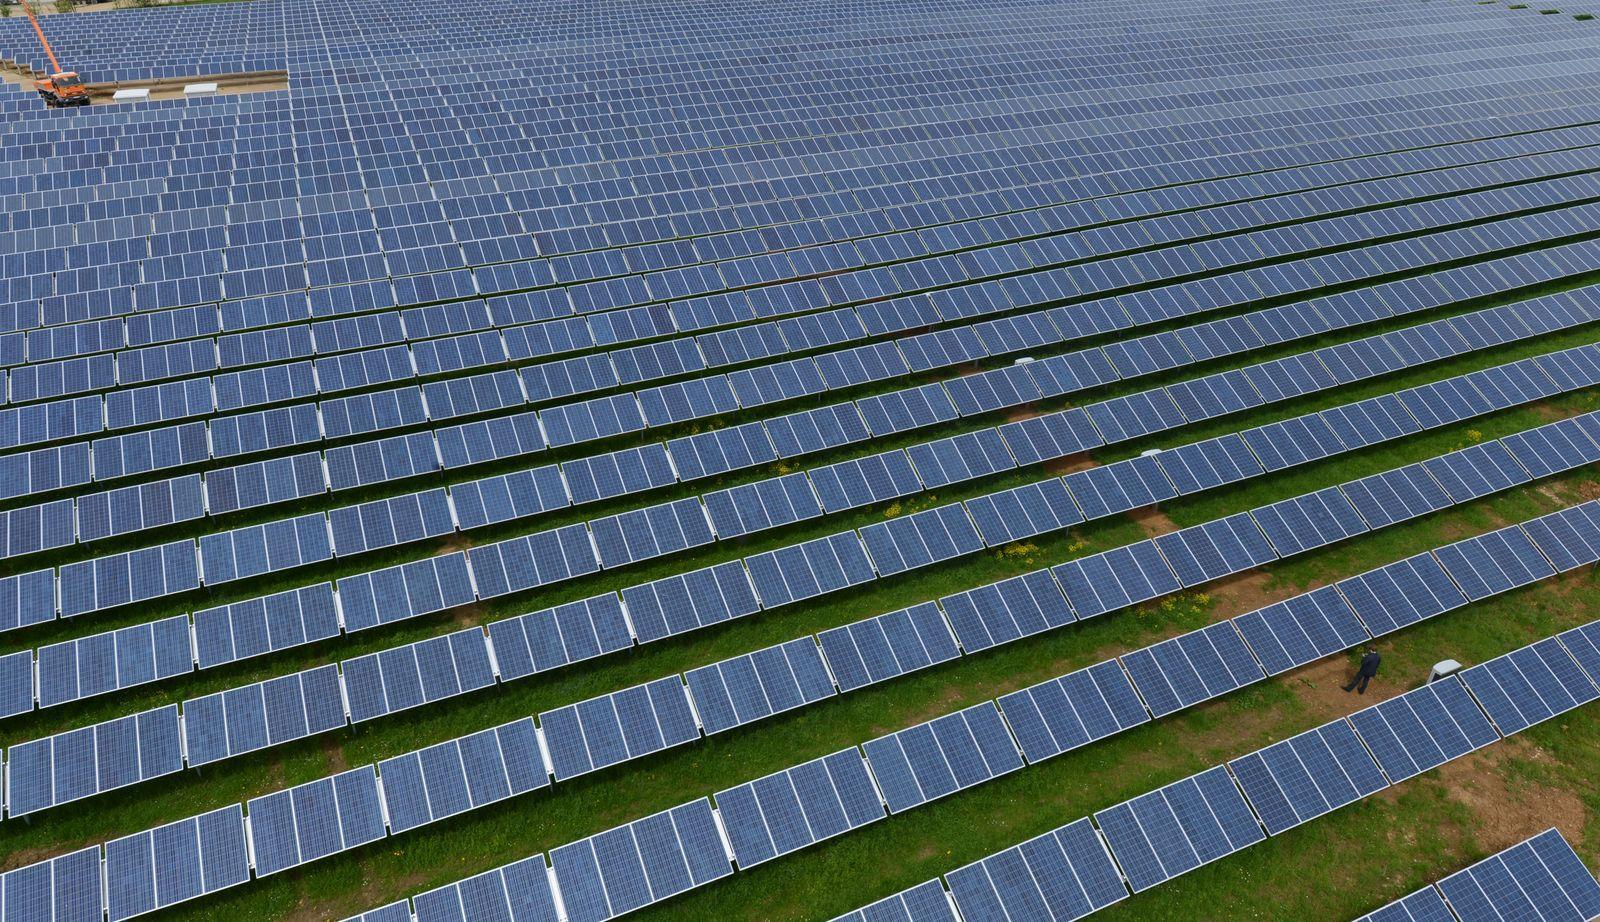 Eröffnung Solarpark Mutlanger Heide